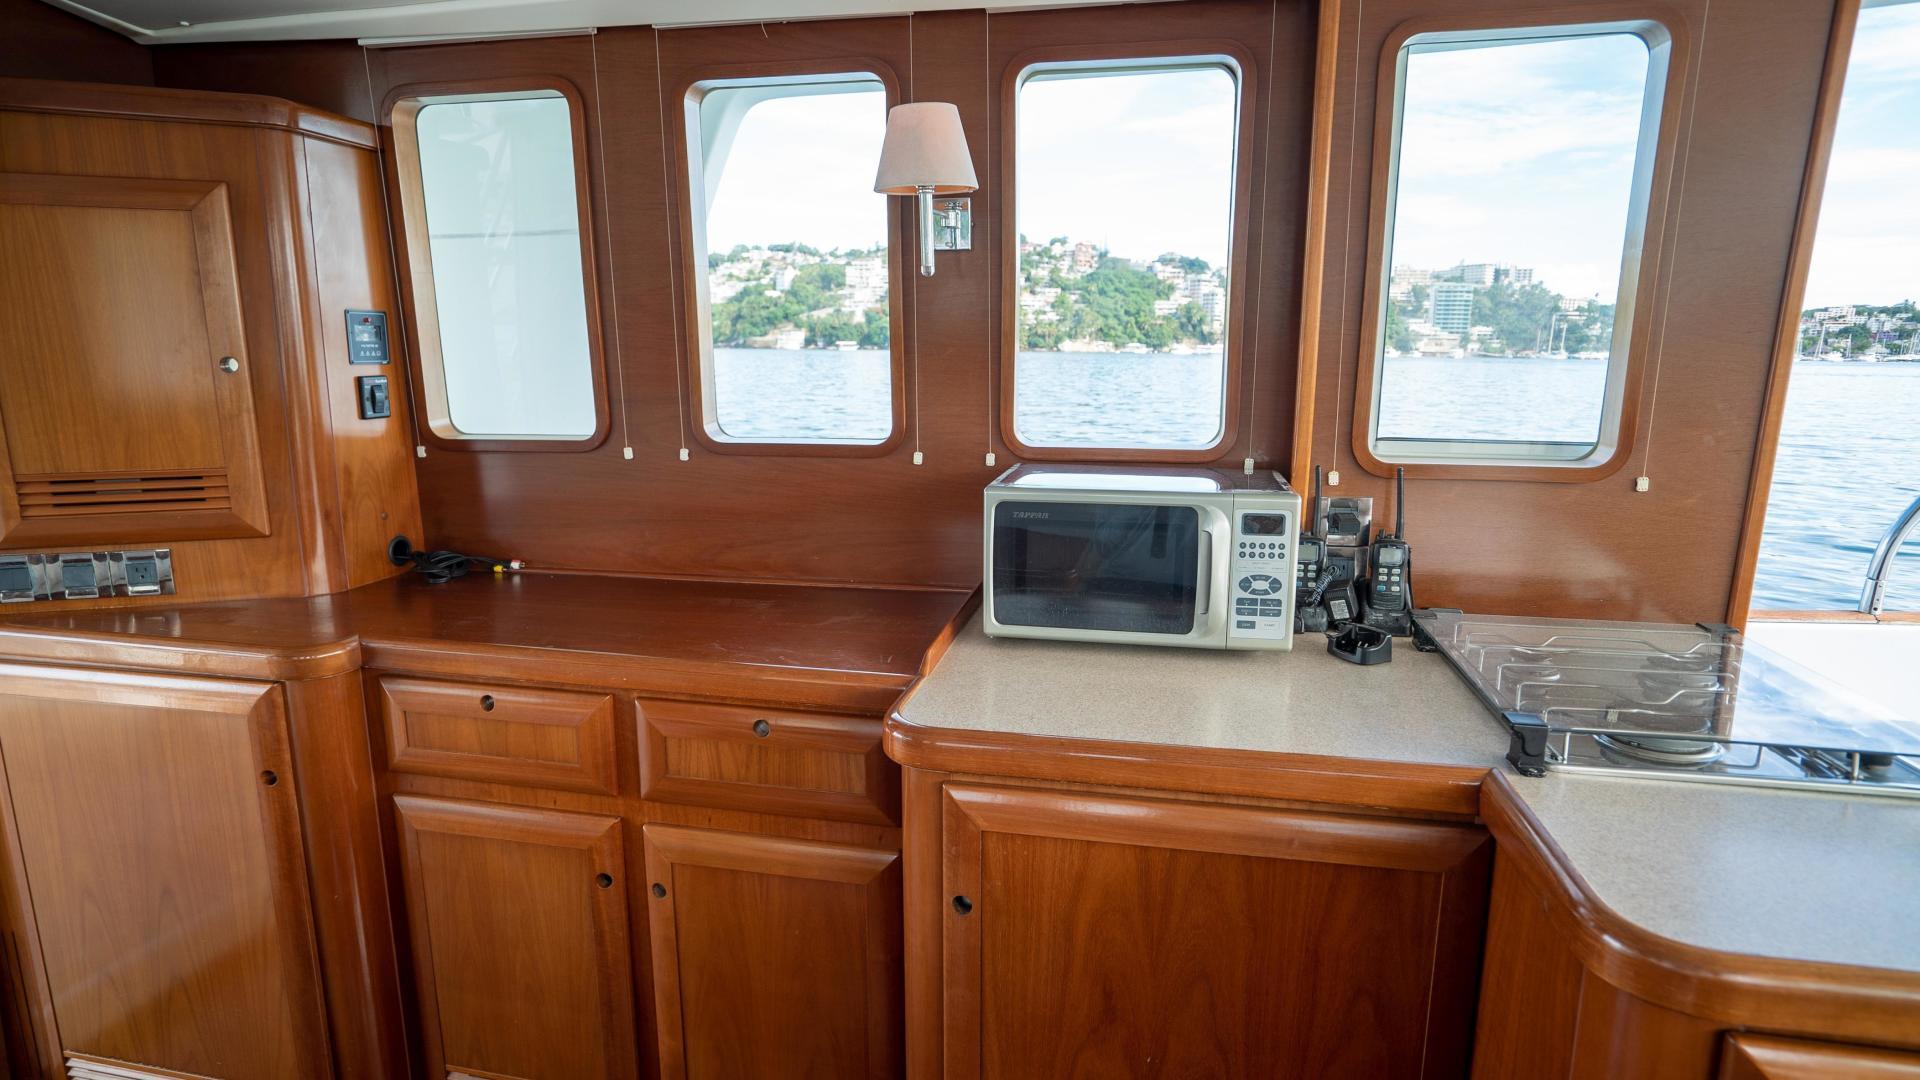 Beneteau-Swift Trawler 2008-Amadeus Acapulco-Mexico-1487072 | Thumbnail